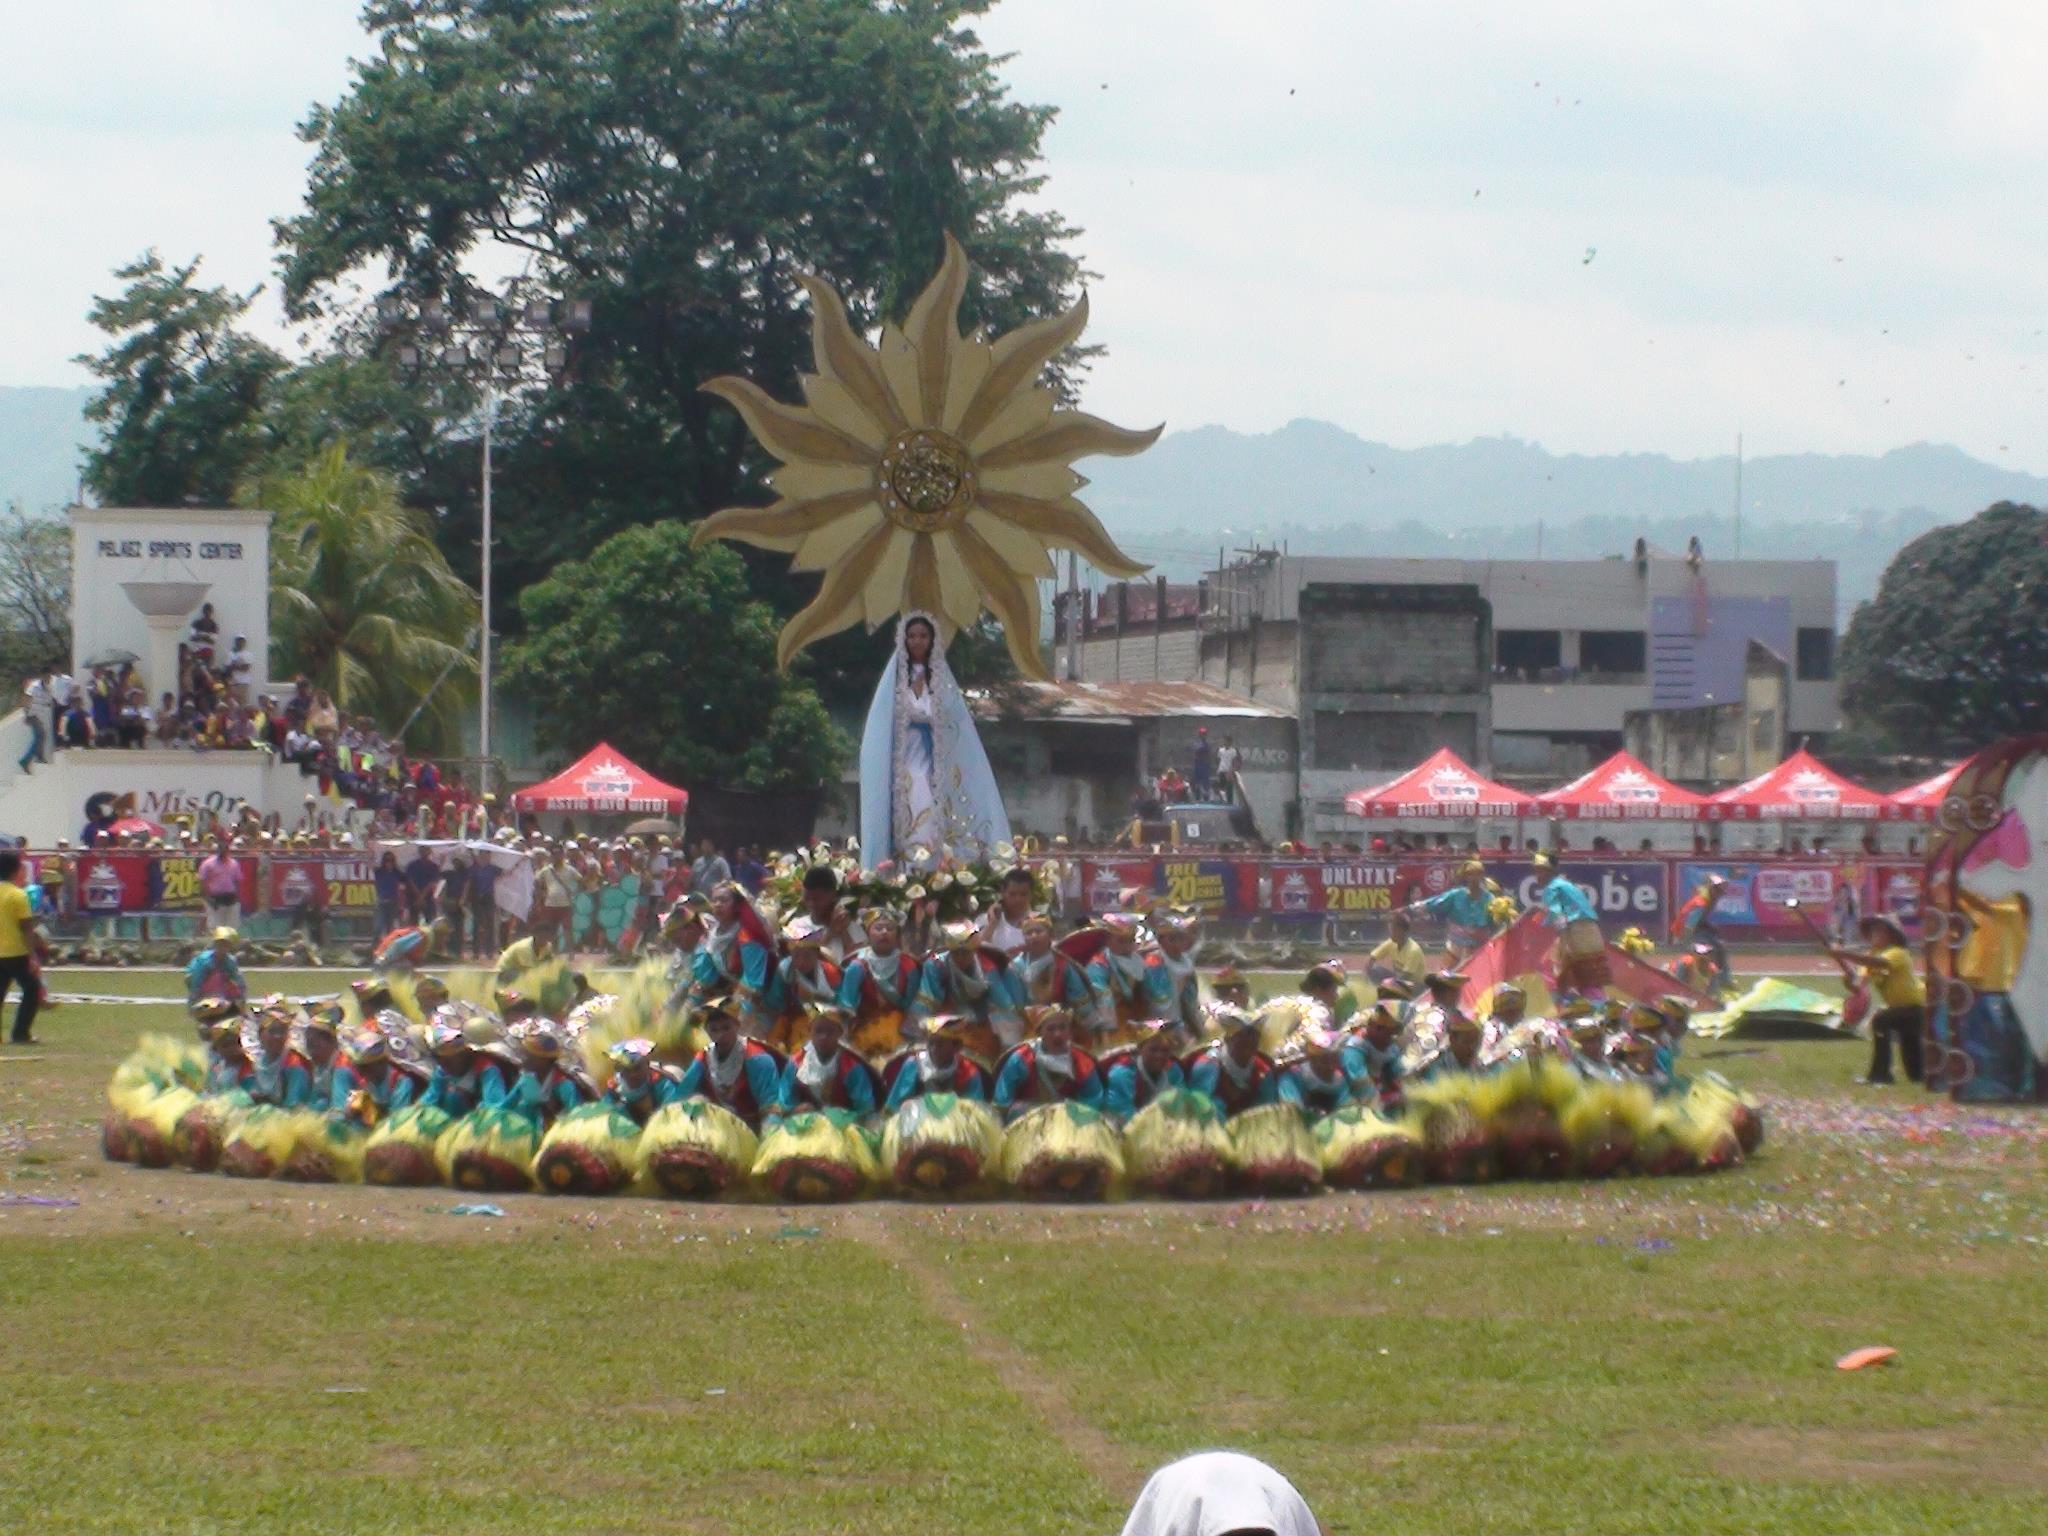 Finding Spain in the heart of Zamboanga City